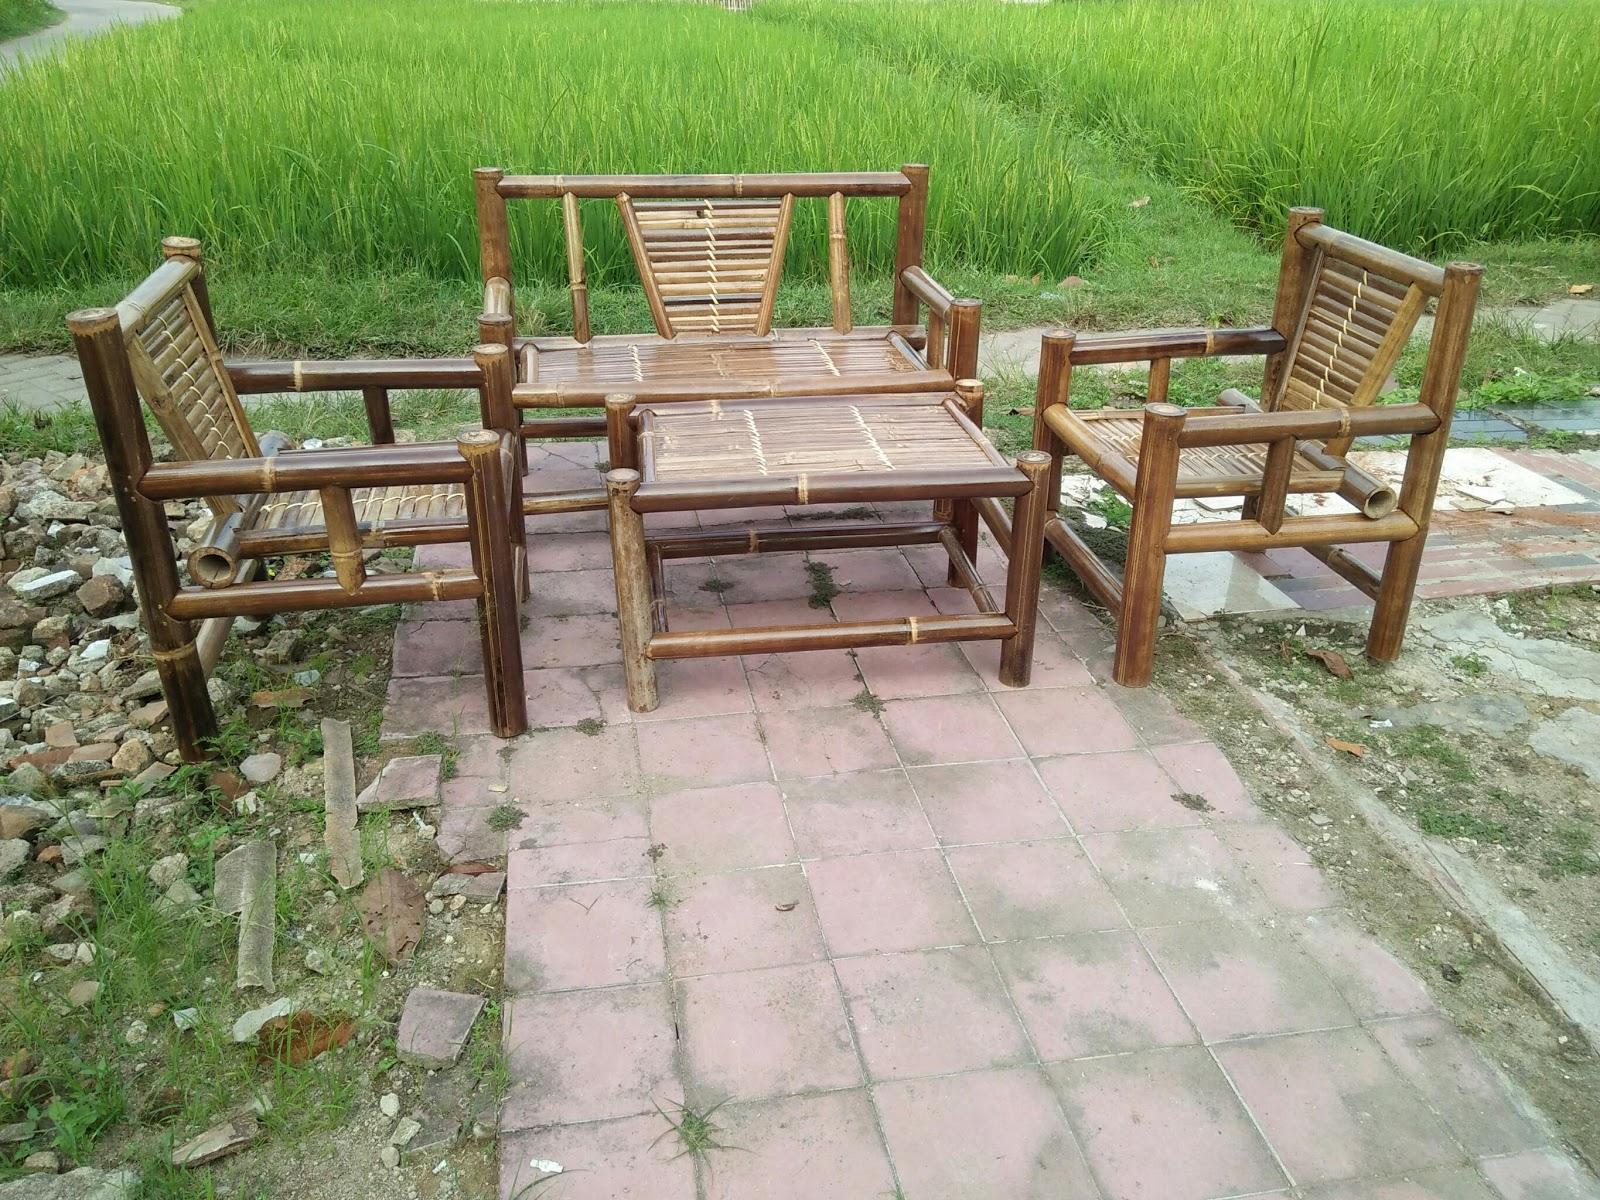 77 Koleksi Model Kursi Bambu Unik Terbaru